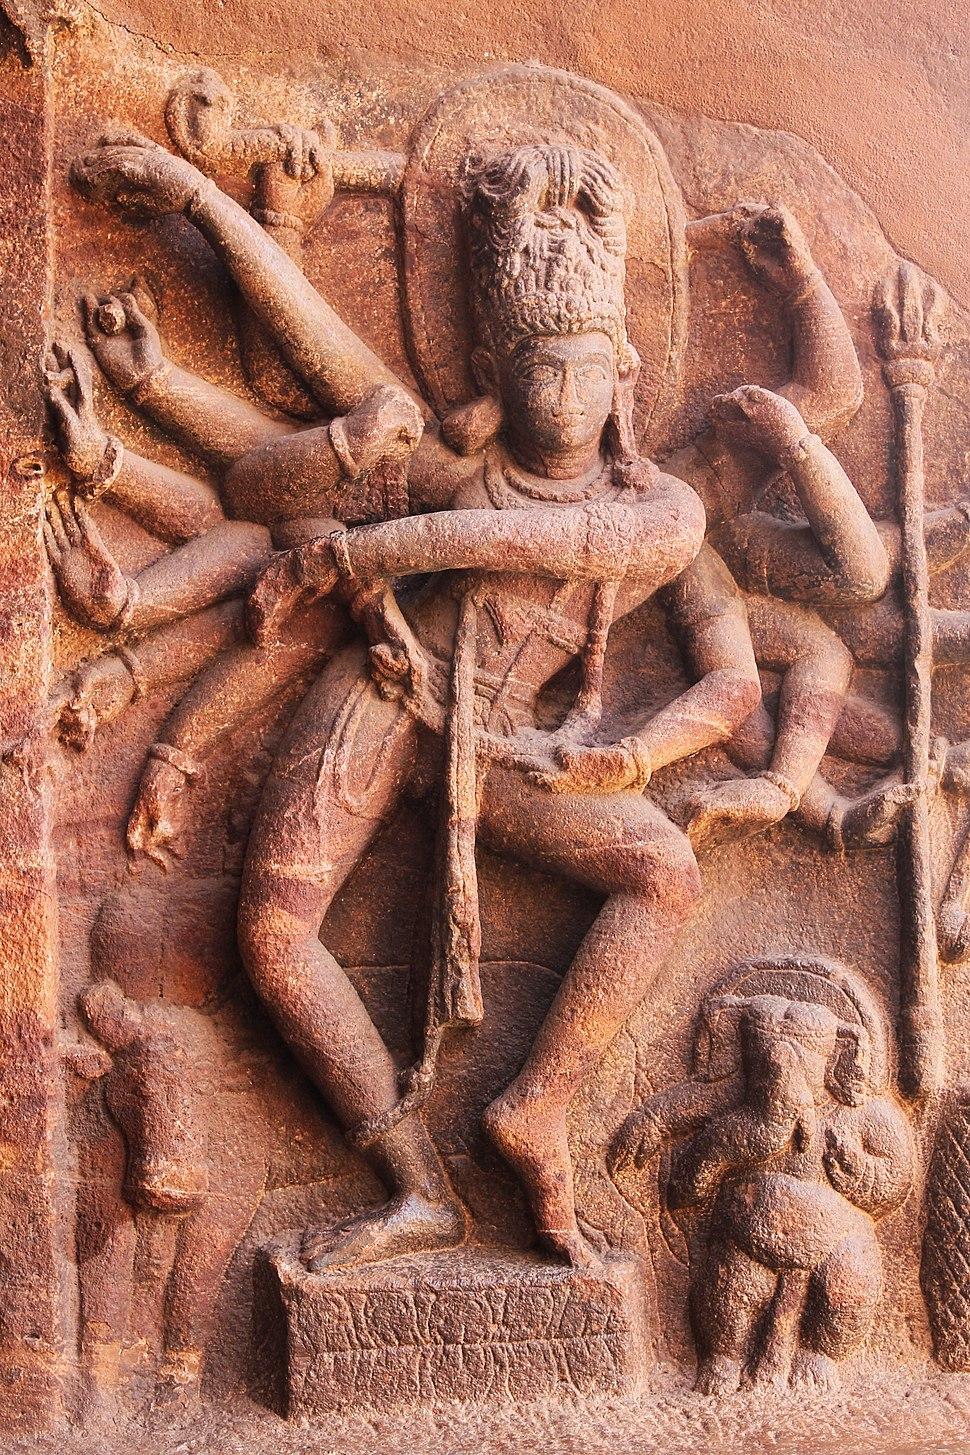 2017 Nataraja Shiva at Badami Hindu temple, Sculpture de Siva